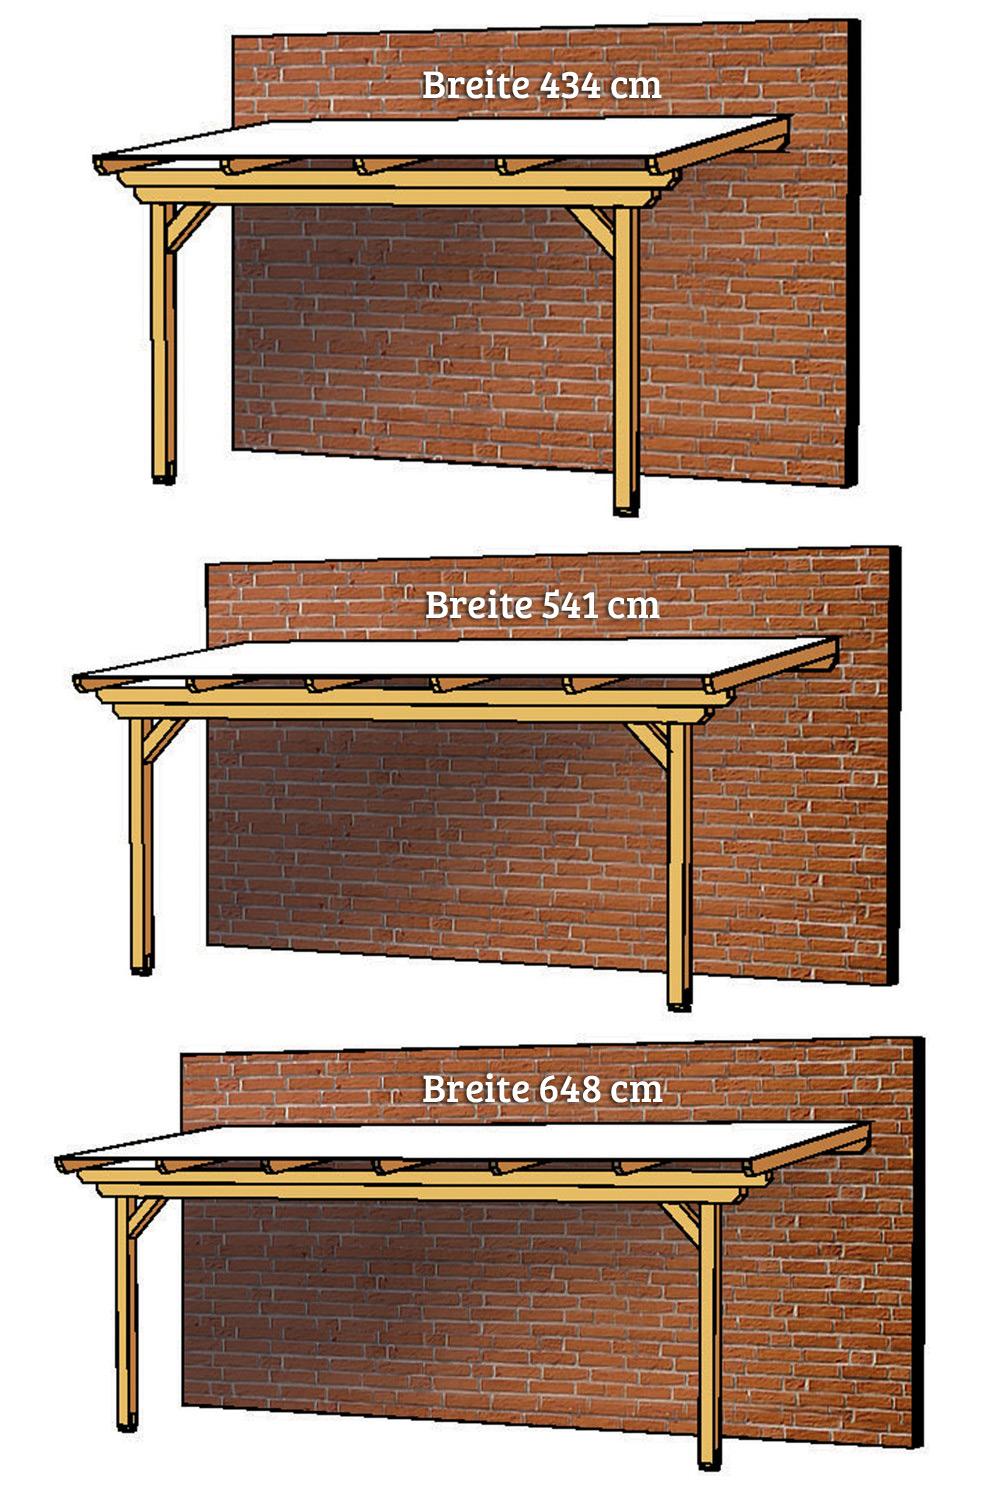 terrassen berdachung holz bausatz skanholz ancona terrassendach holz angebot. Black Bedroom Furniture Sets. Home Design Ideas